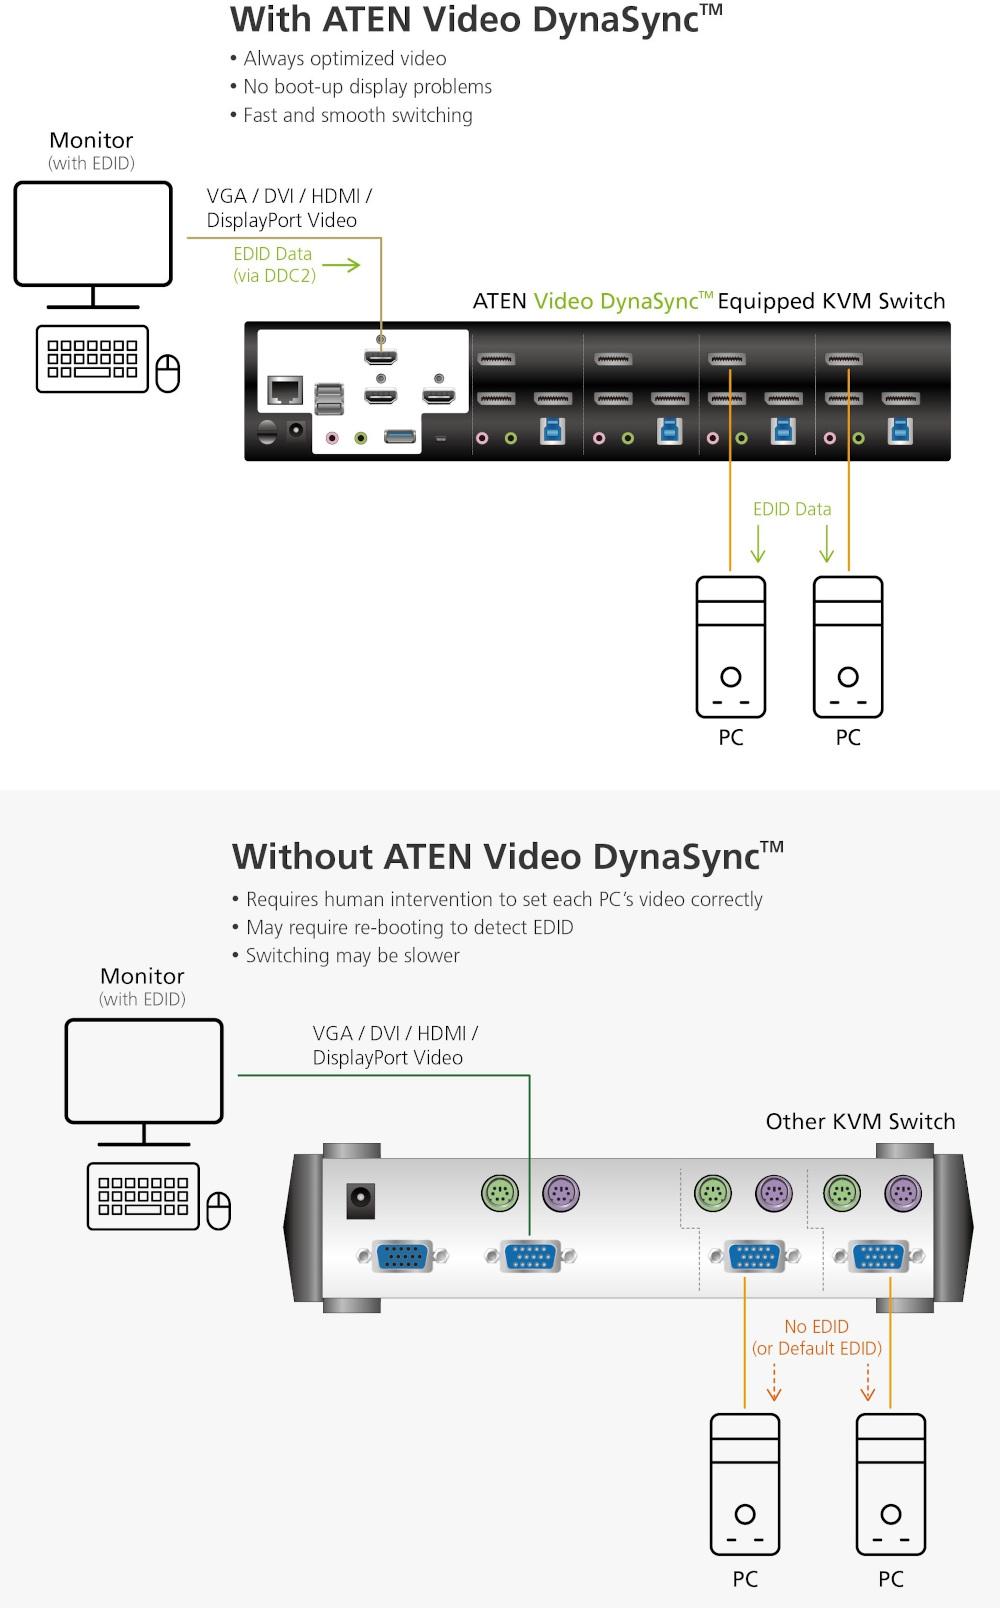 ATEN Video DynaSync 4